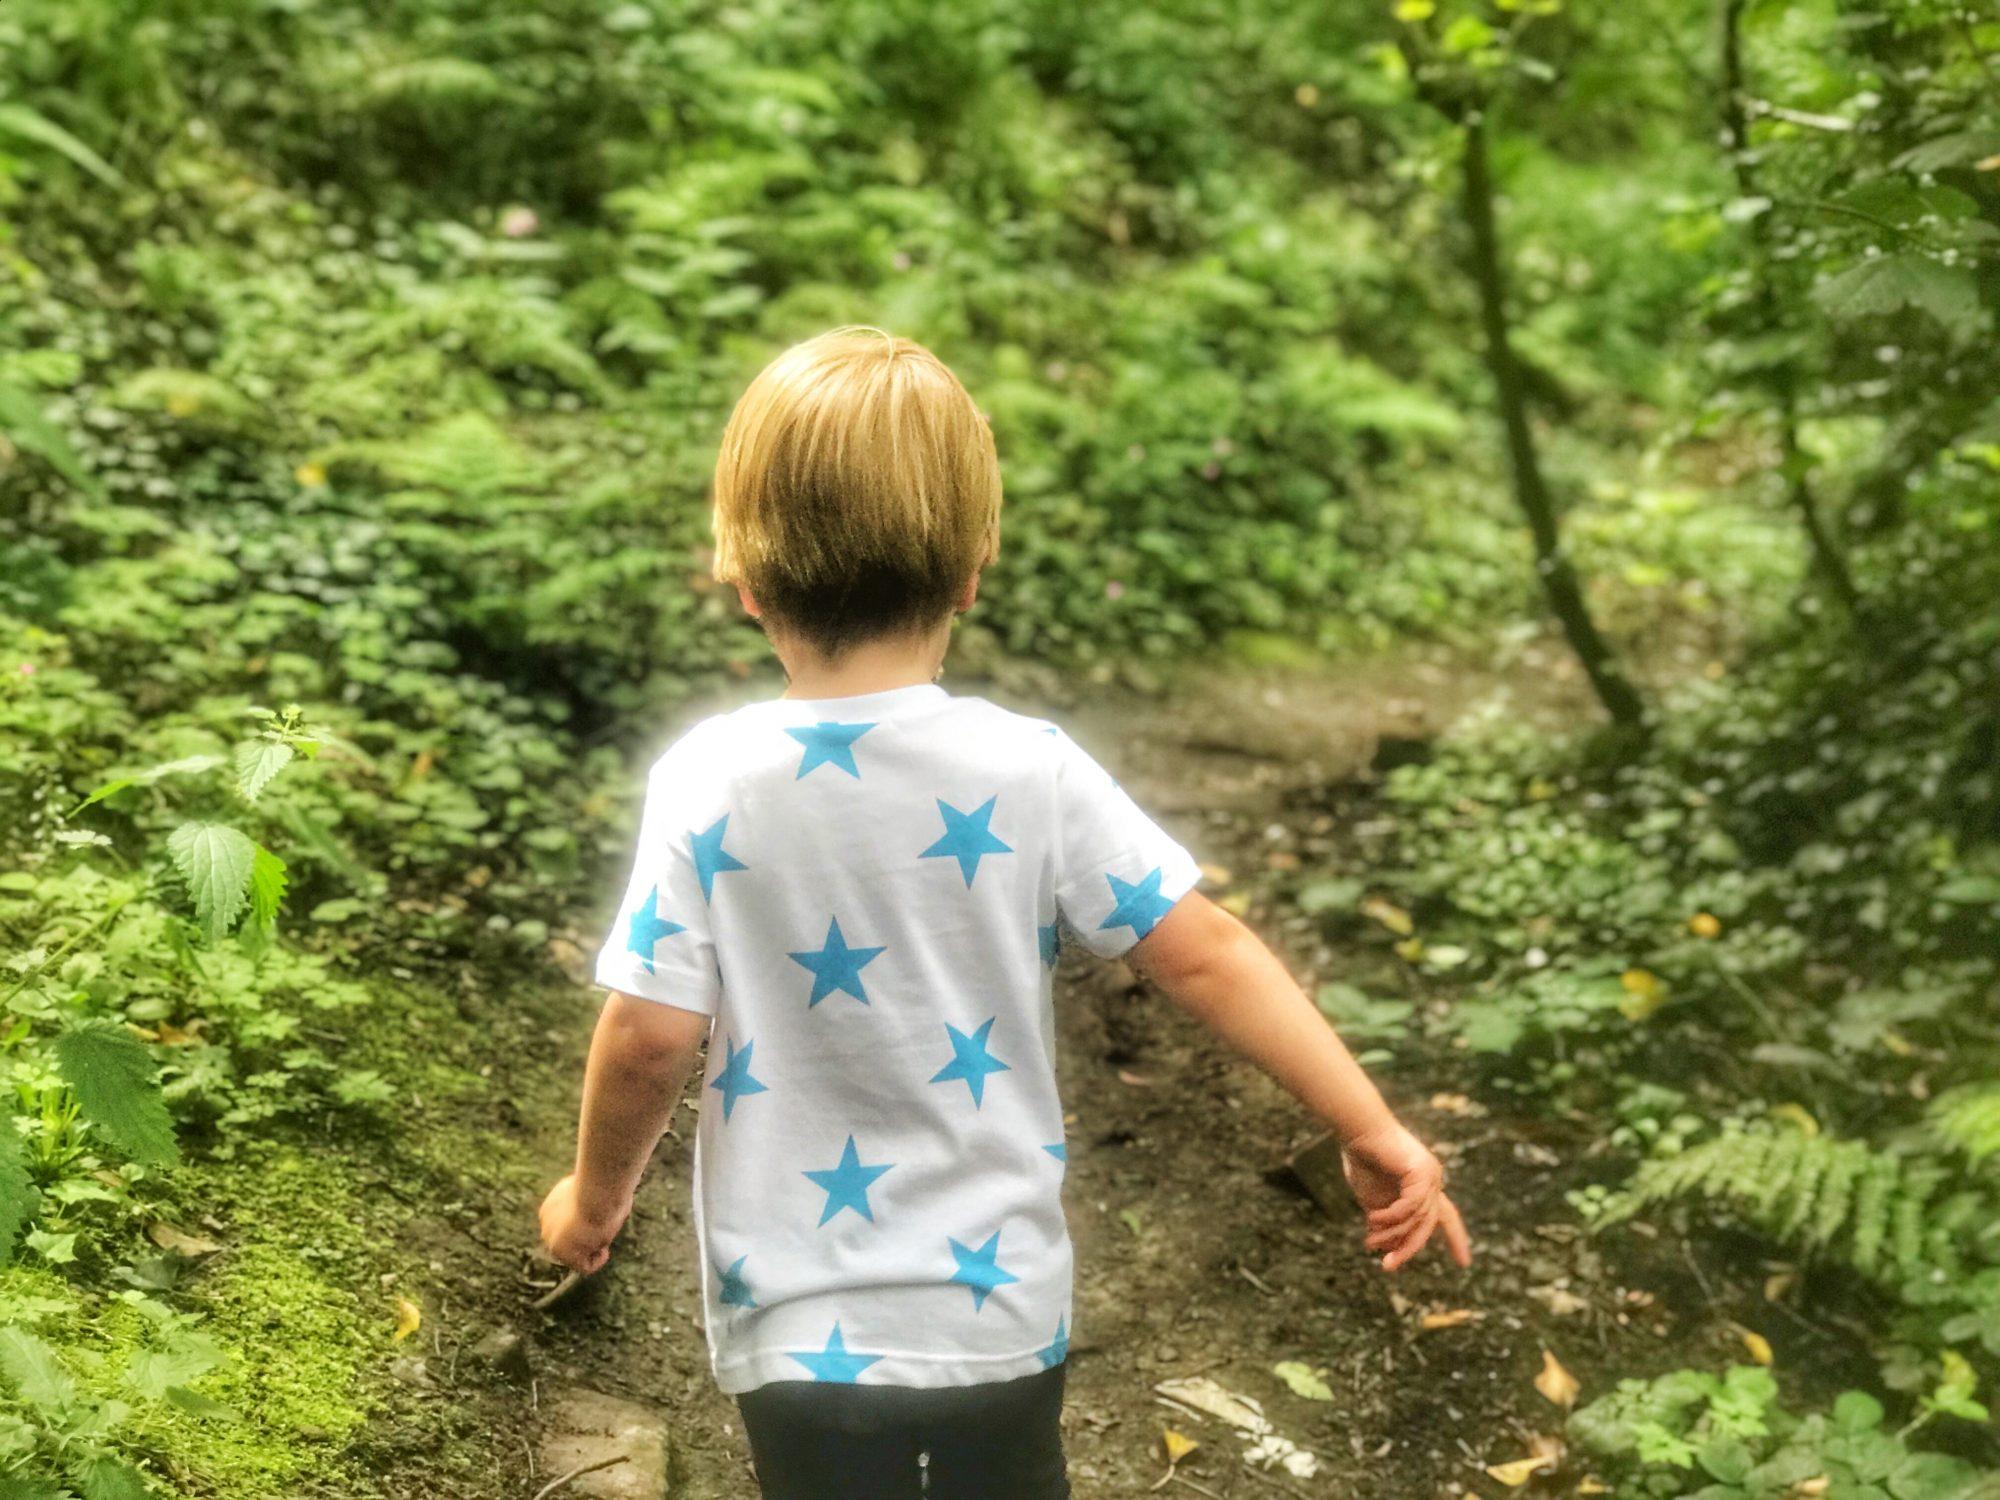 Dexter walking along a path next to greenery in Fairy Glen, Parbold